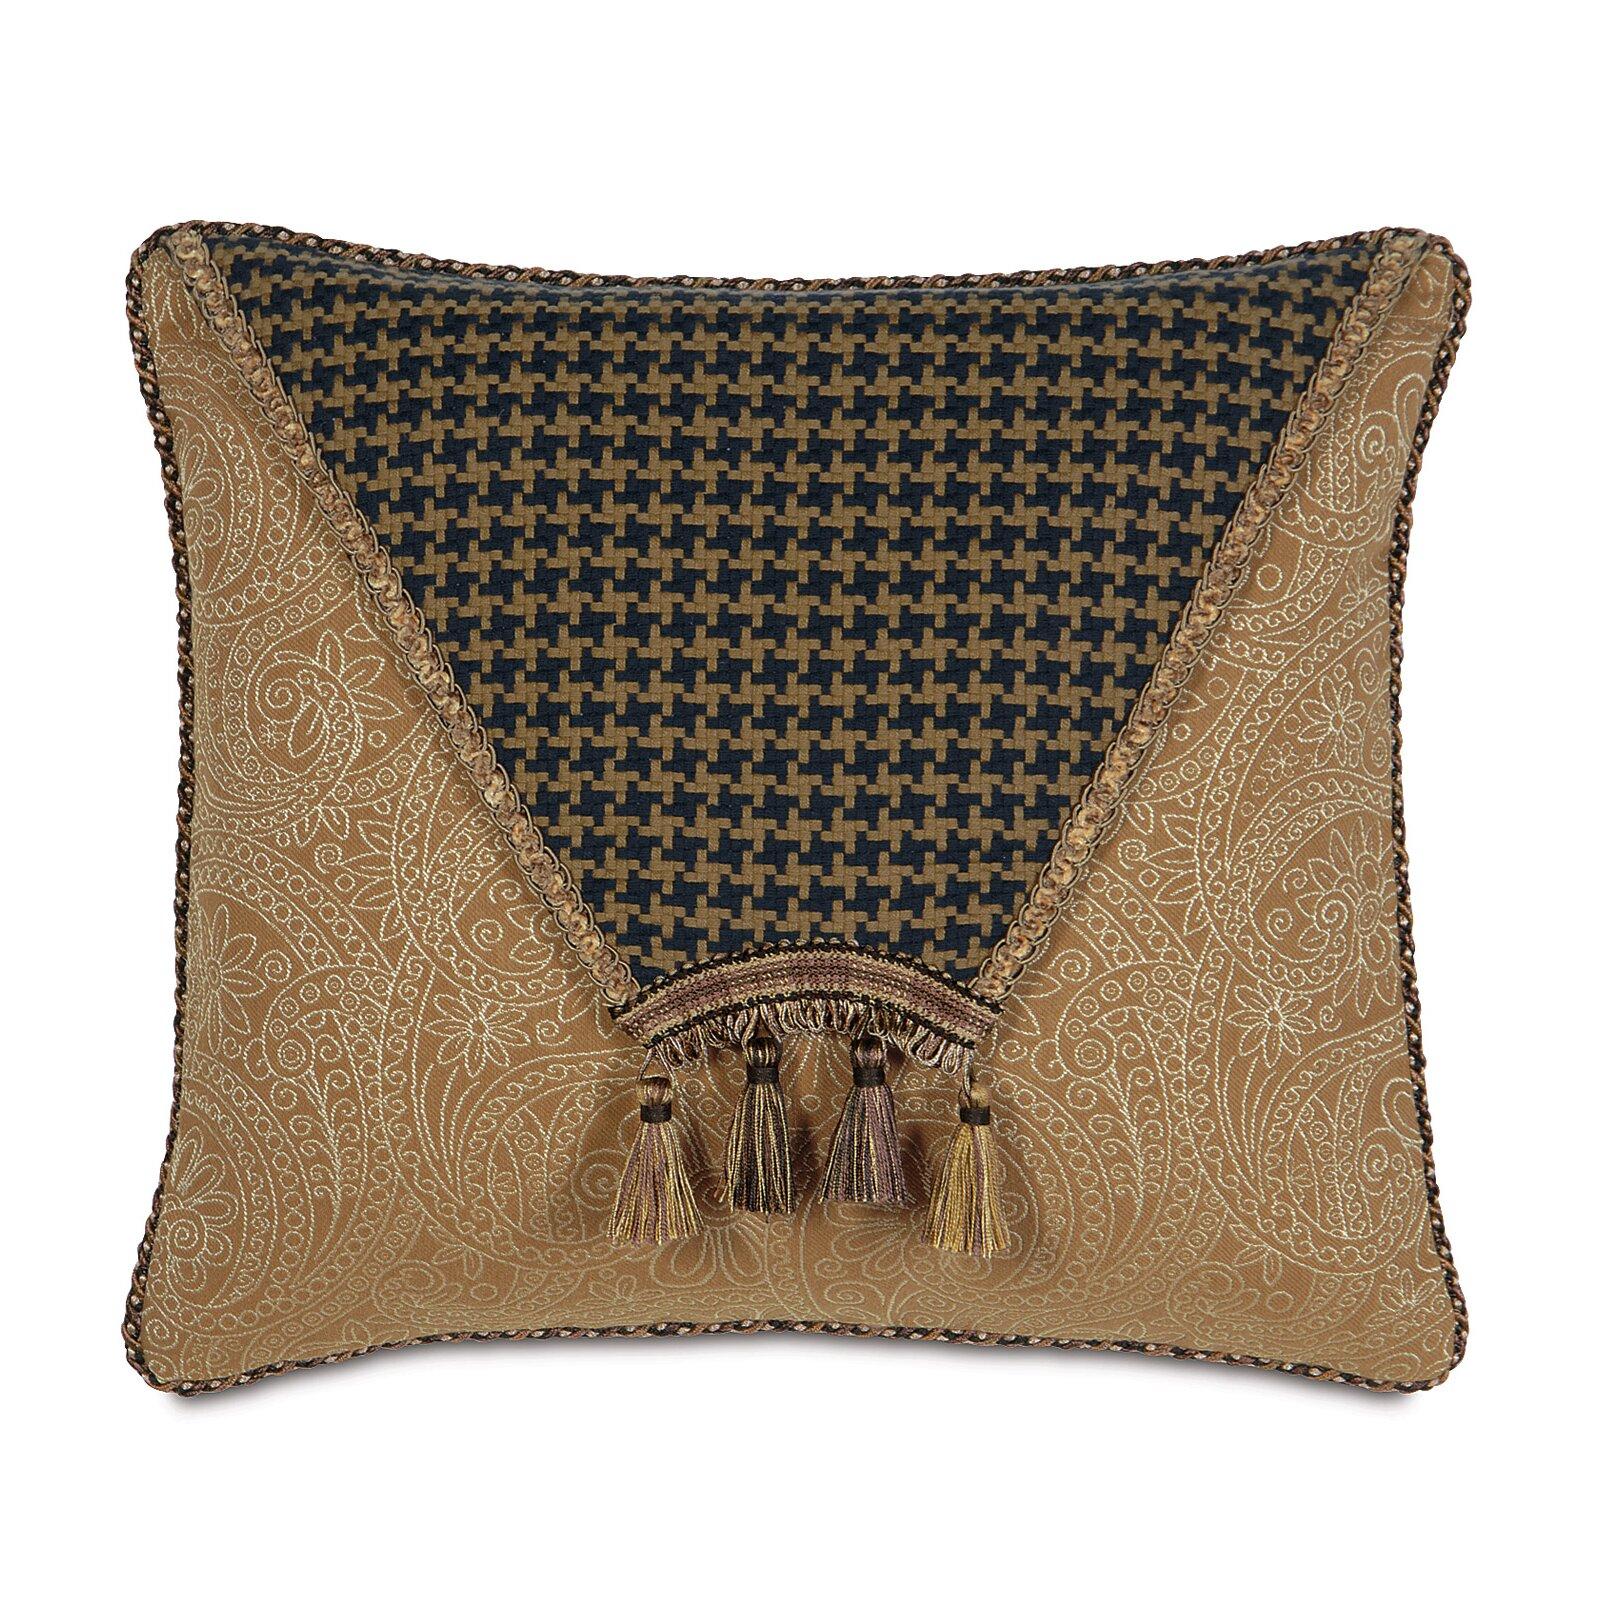 Eastern Accents Aston Envelope Throw Pillow Wayfair.ca